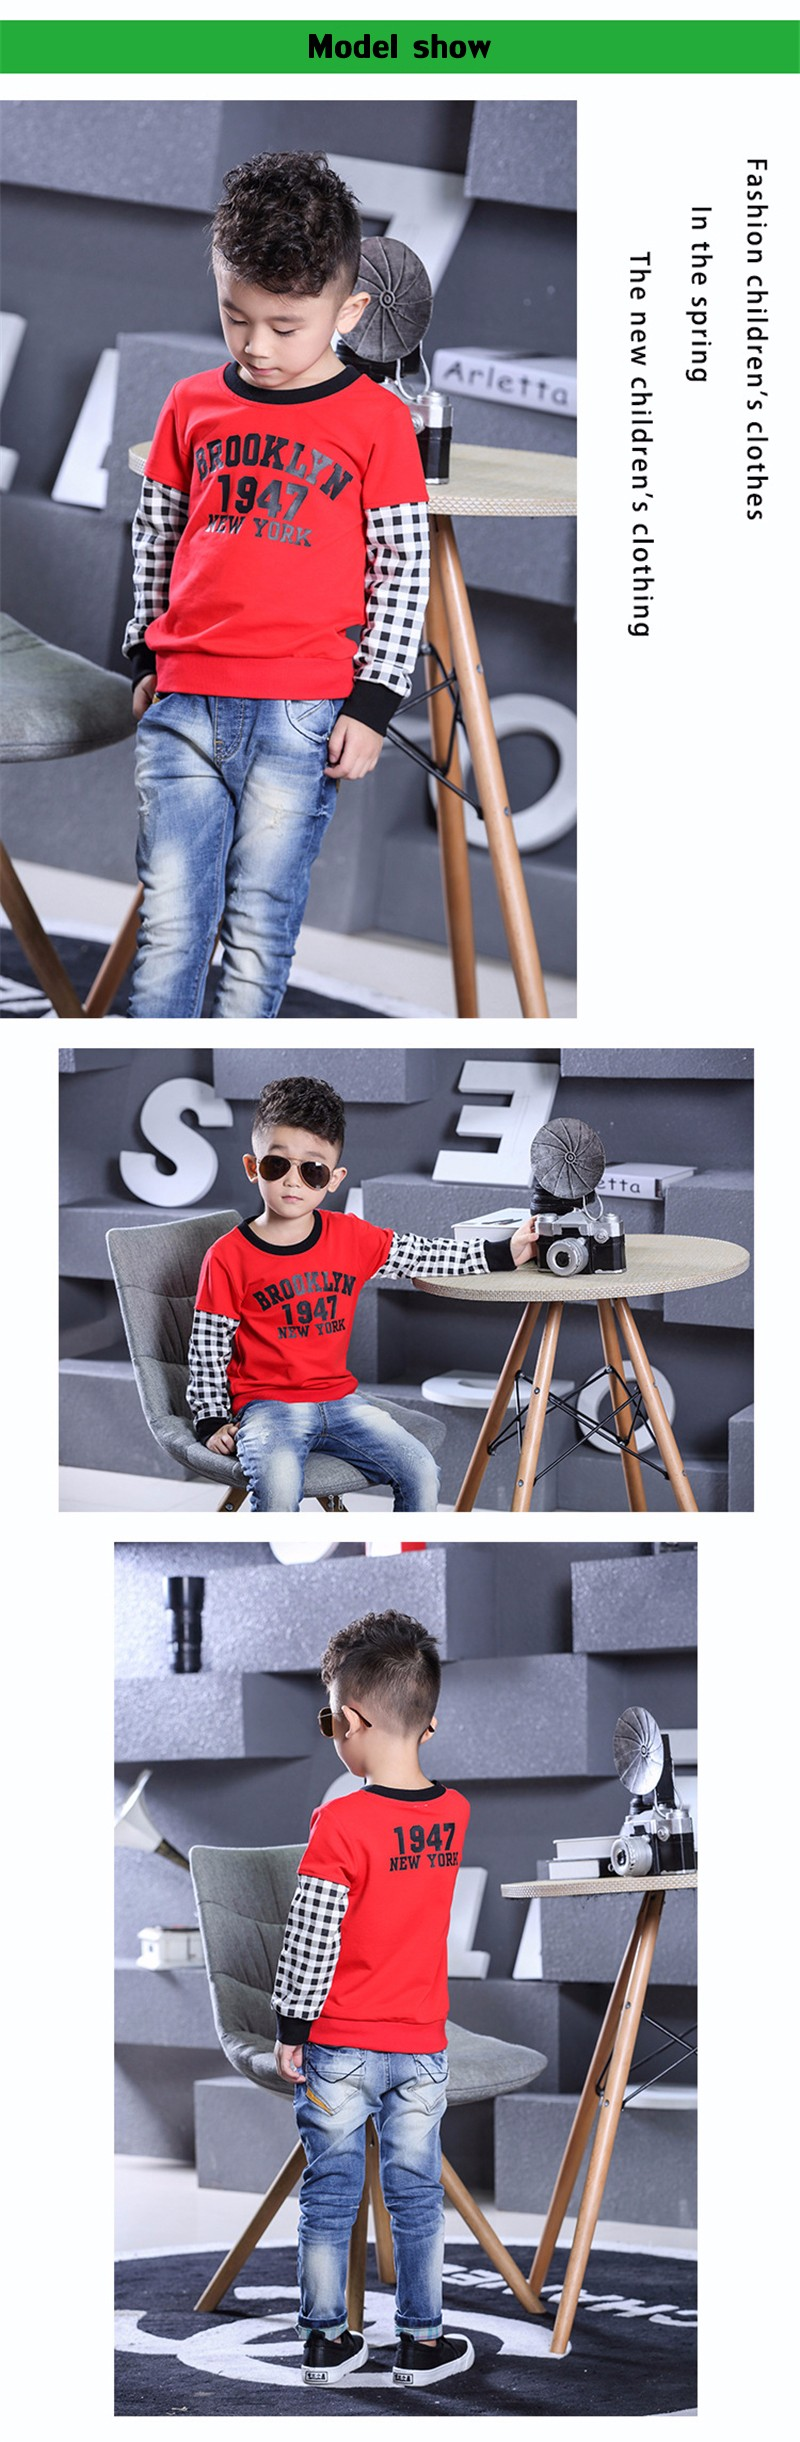 T-Shirt For Boy Sweater Ruffle Raglan Shirts Child Bobo Choses  The Boy\'s Clothes Kids Tees Children Tops Teenage Boys Clothing 13